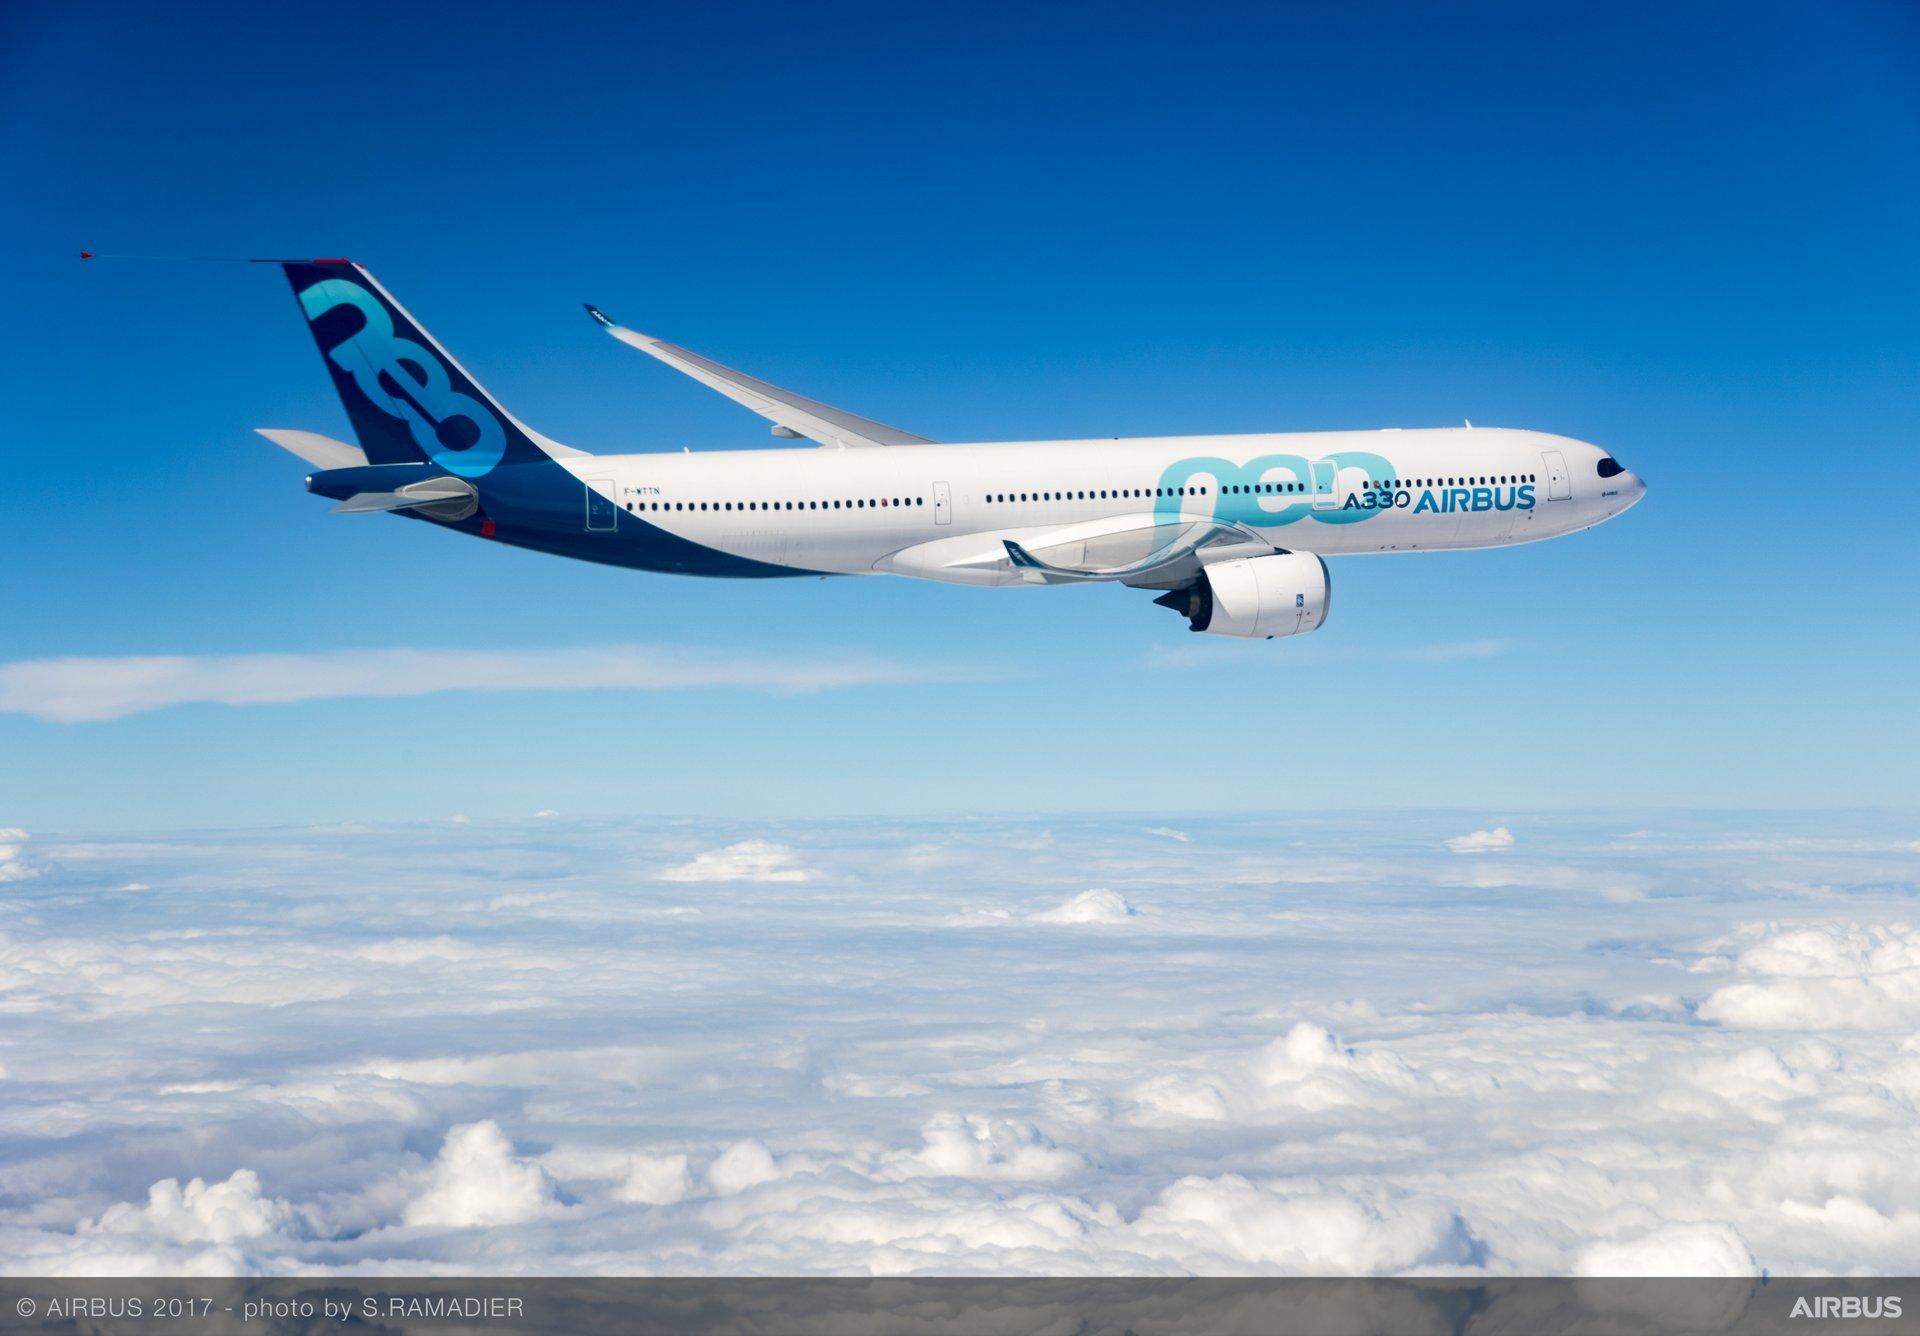 Airbus readies large-scale presence at Aero India